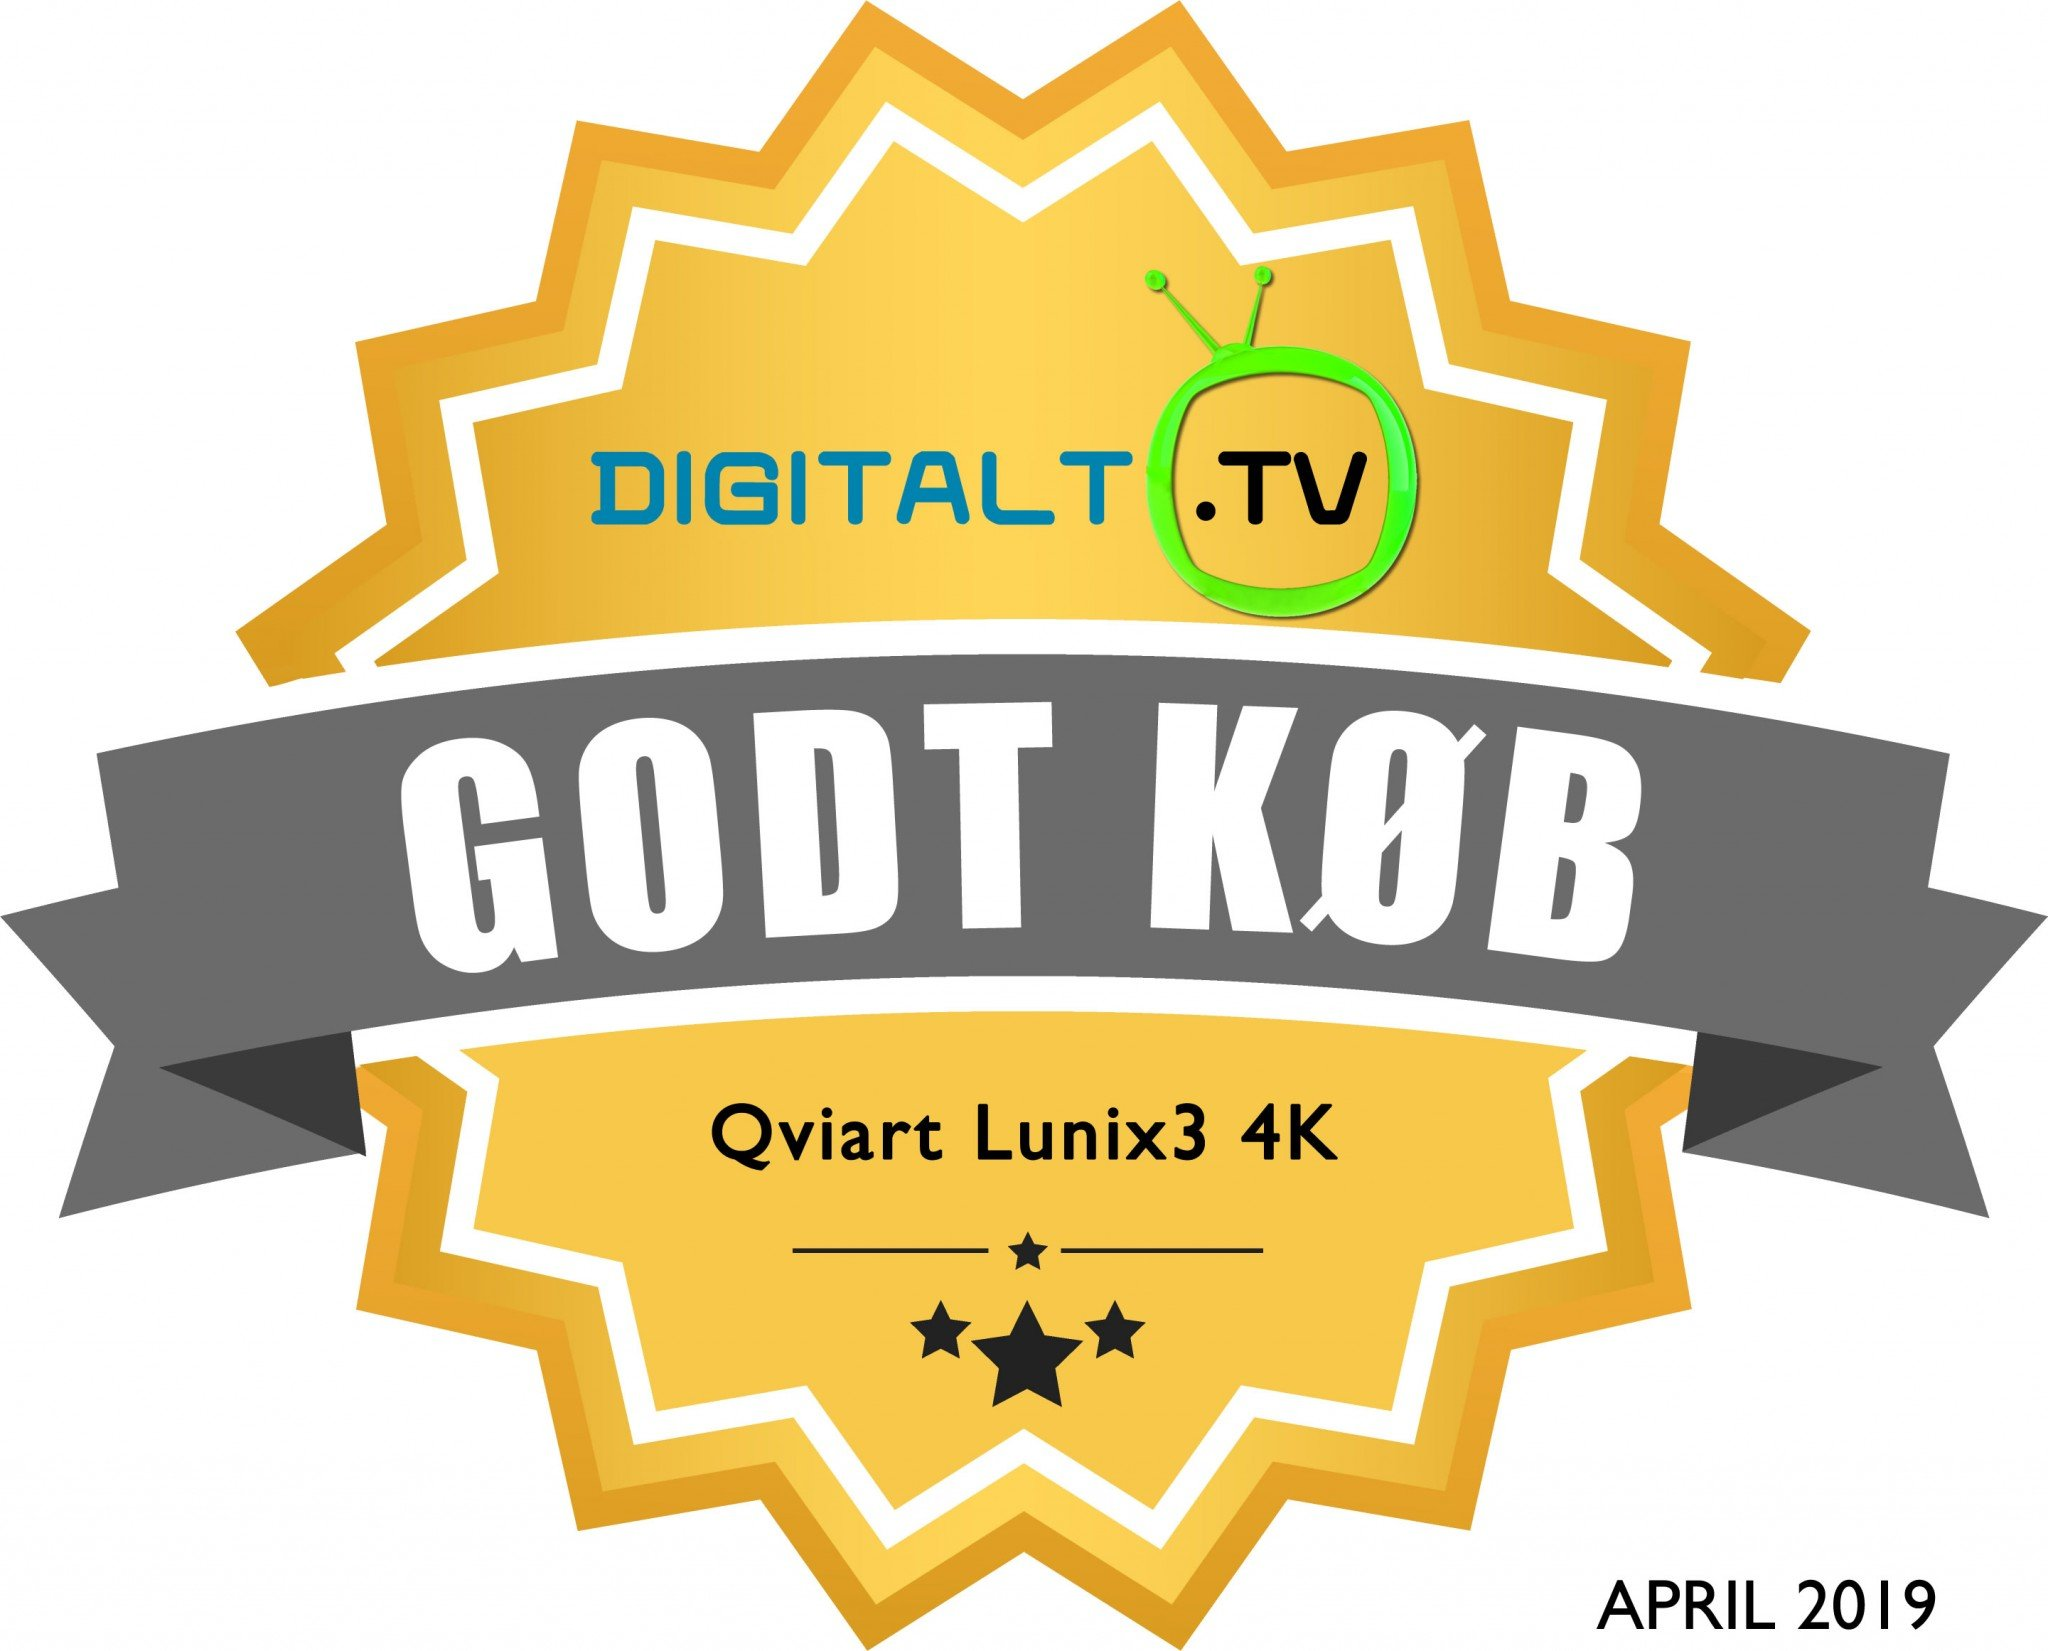 Qviart Lunix3 4K Logo anbefaling